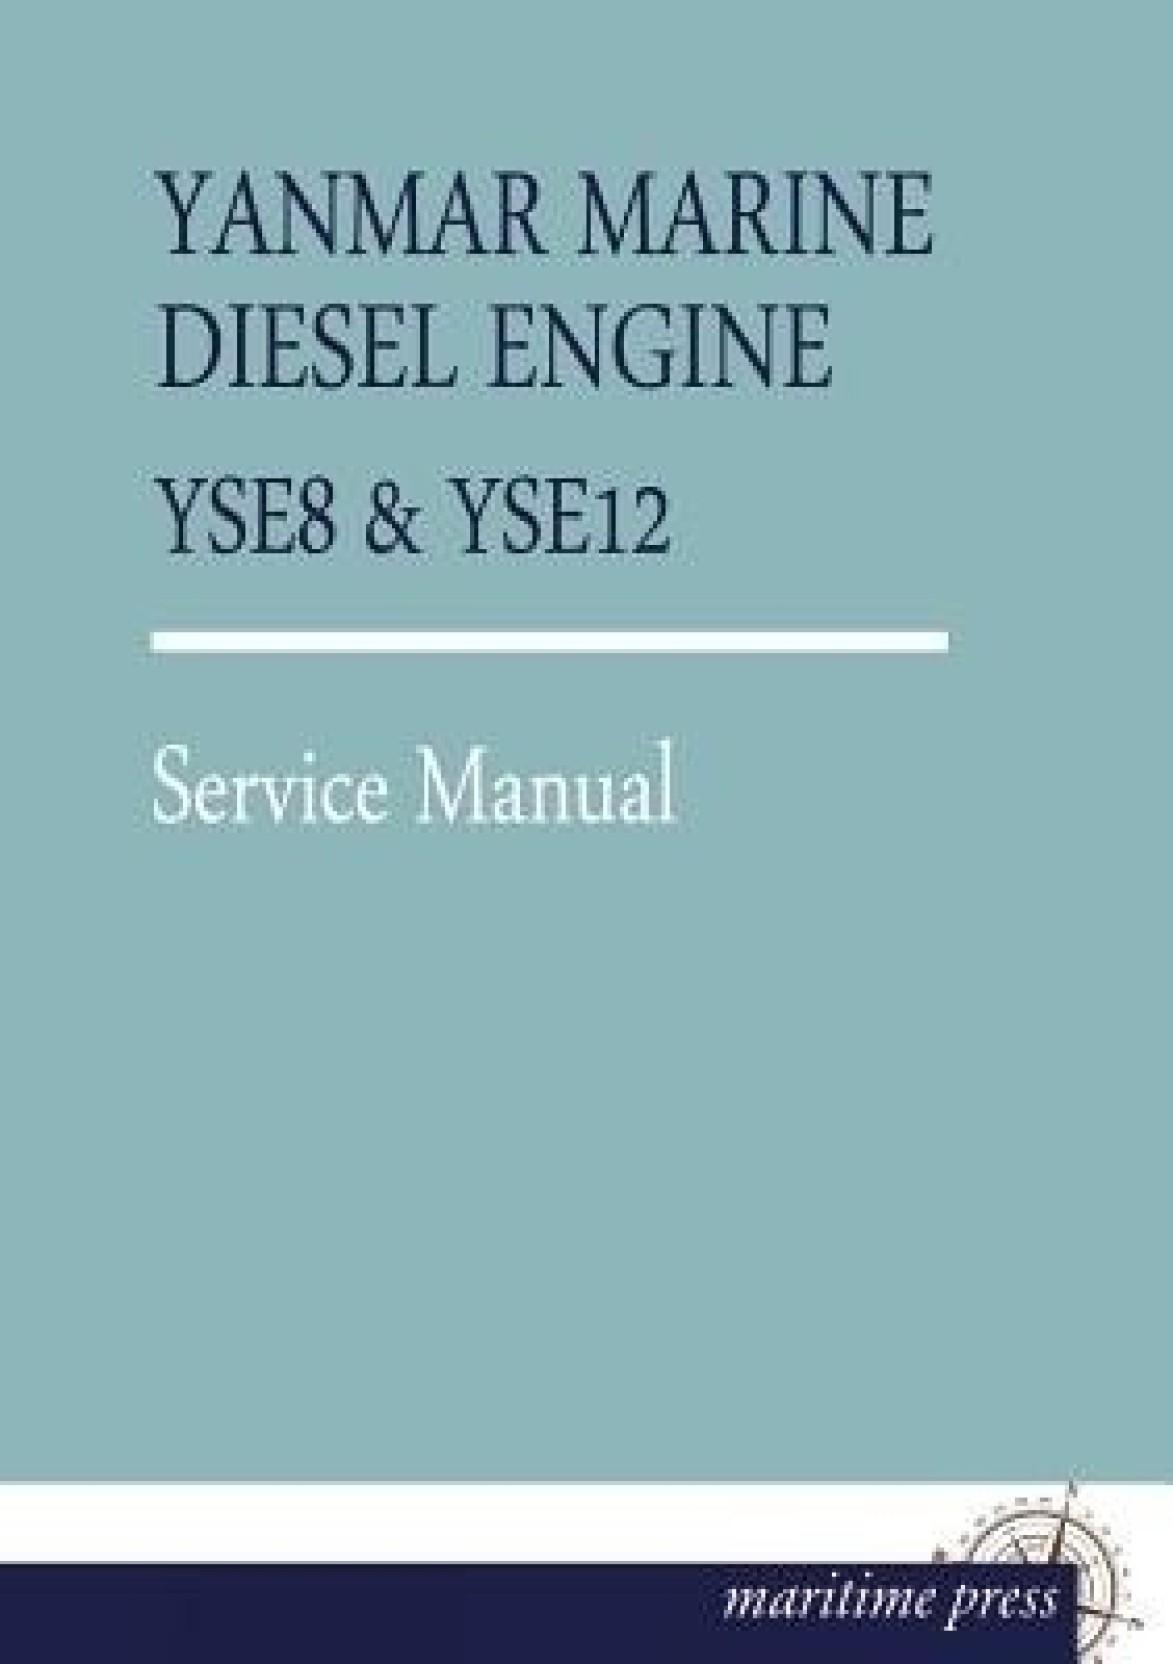 Yanmar Marine Diesel Engine Yse8. Share